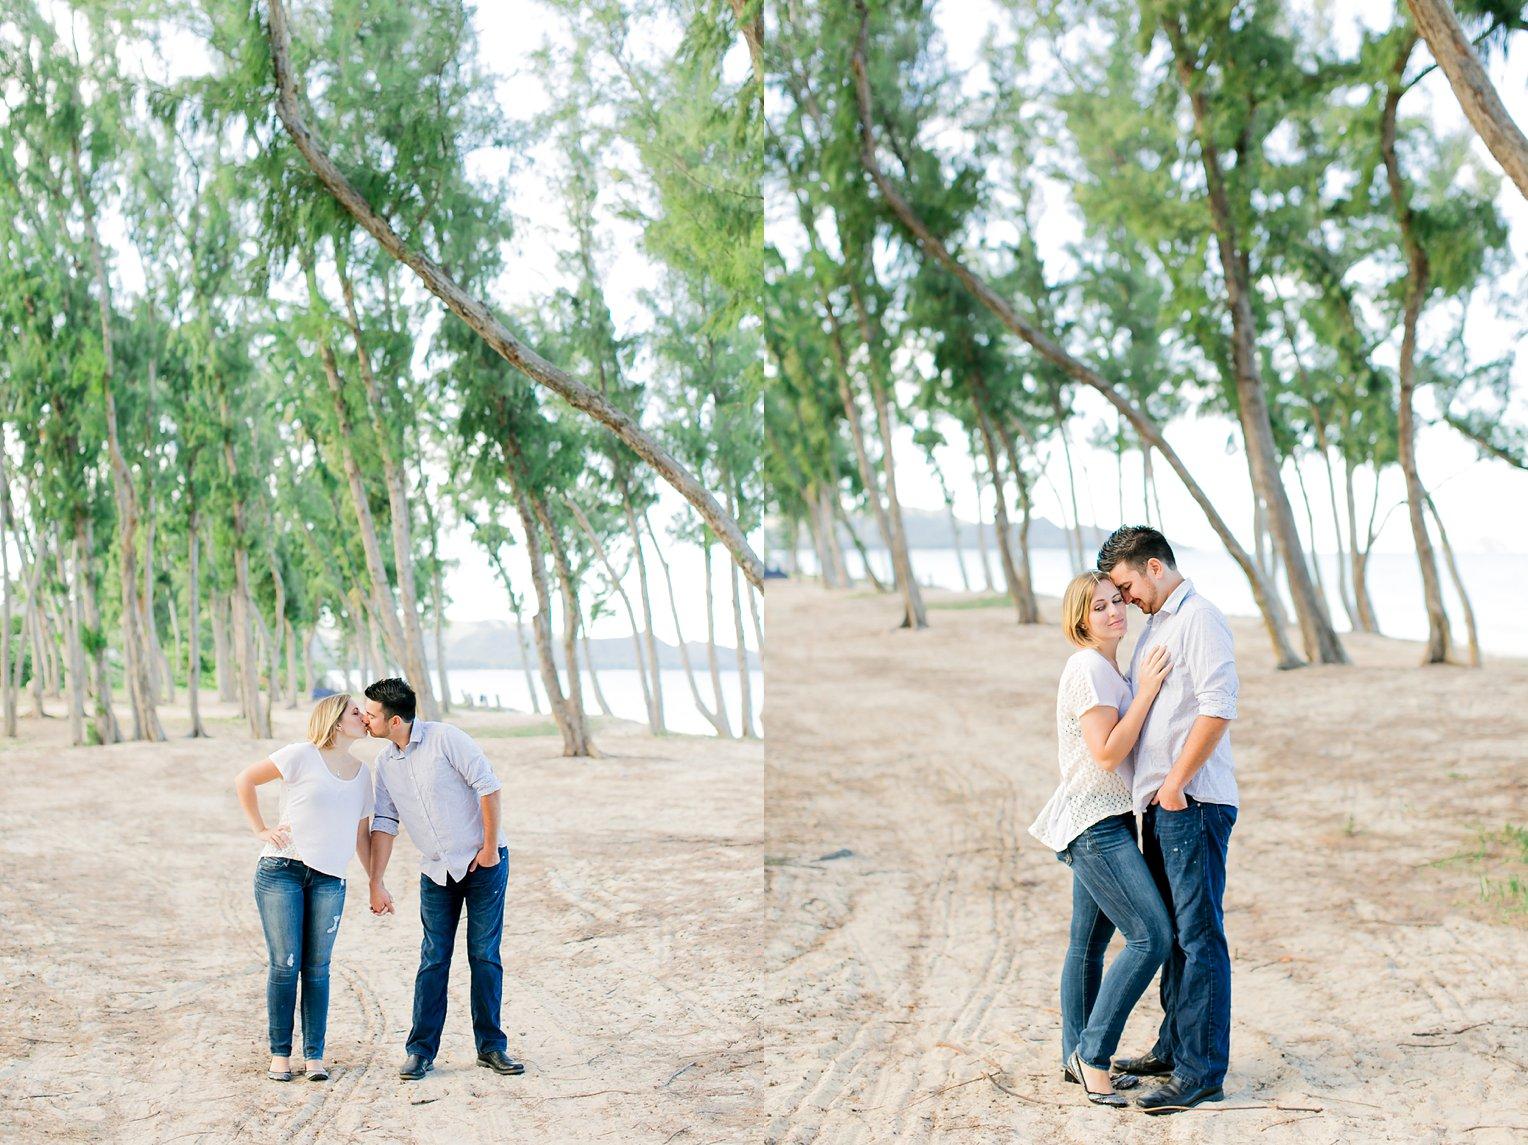 Oahu Engagement Photographer Hawaii Wedding Photographer_0010.jpg